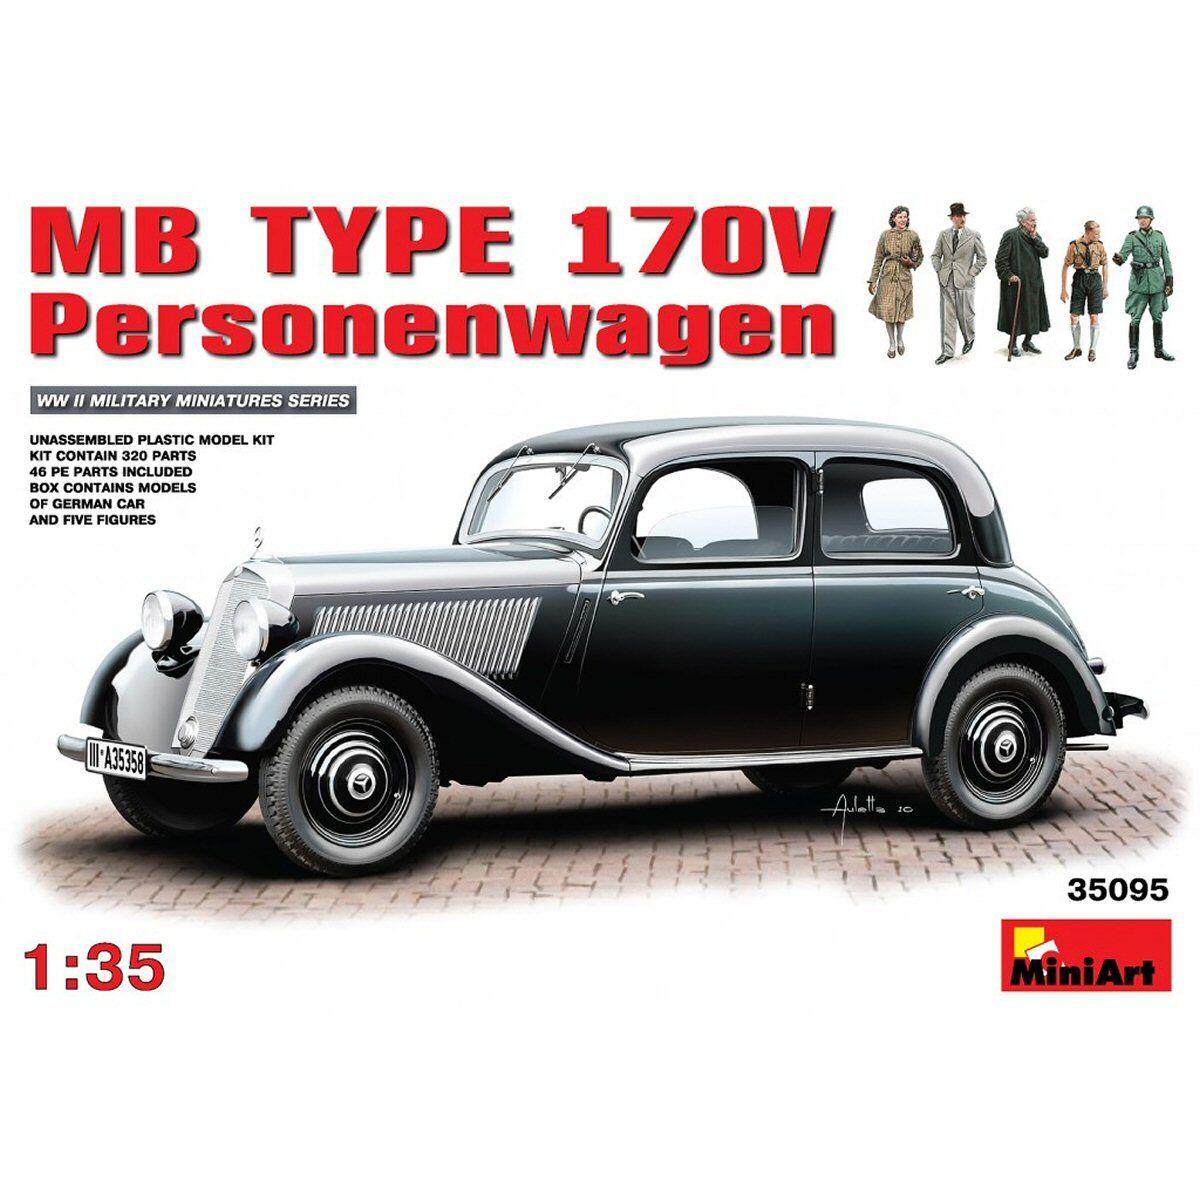 MiniArt 35095 MB Type 170 V Personenwagen 1 35 scale plastic model kit